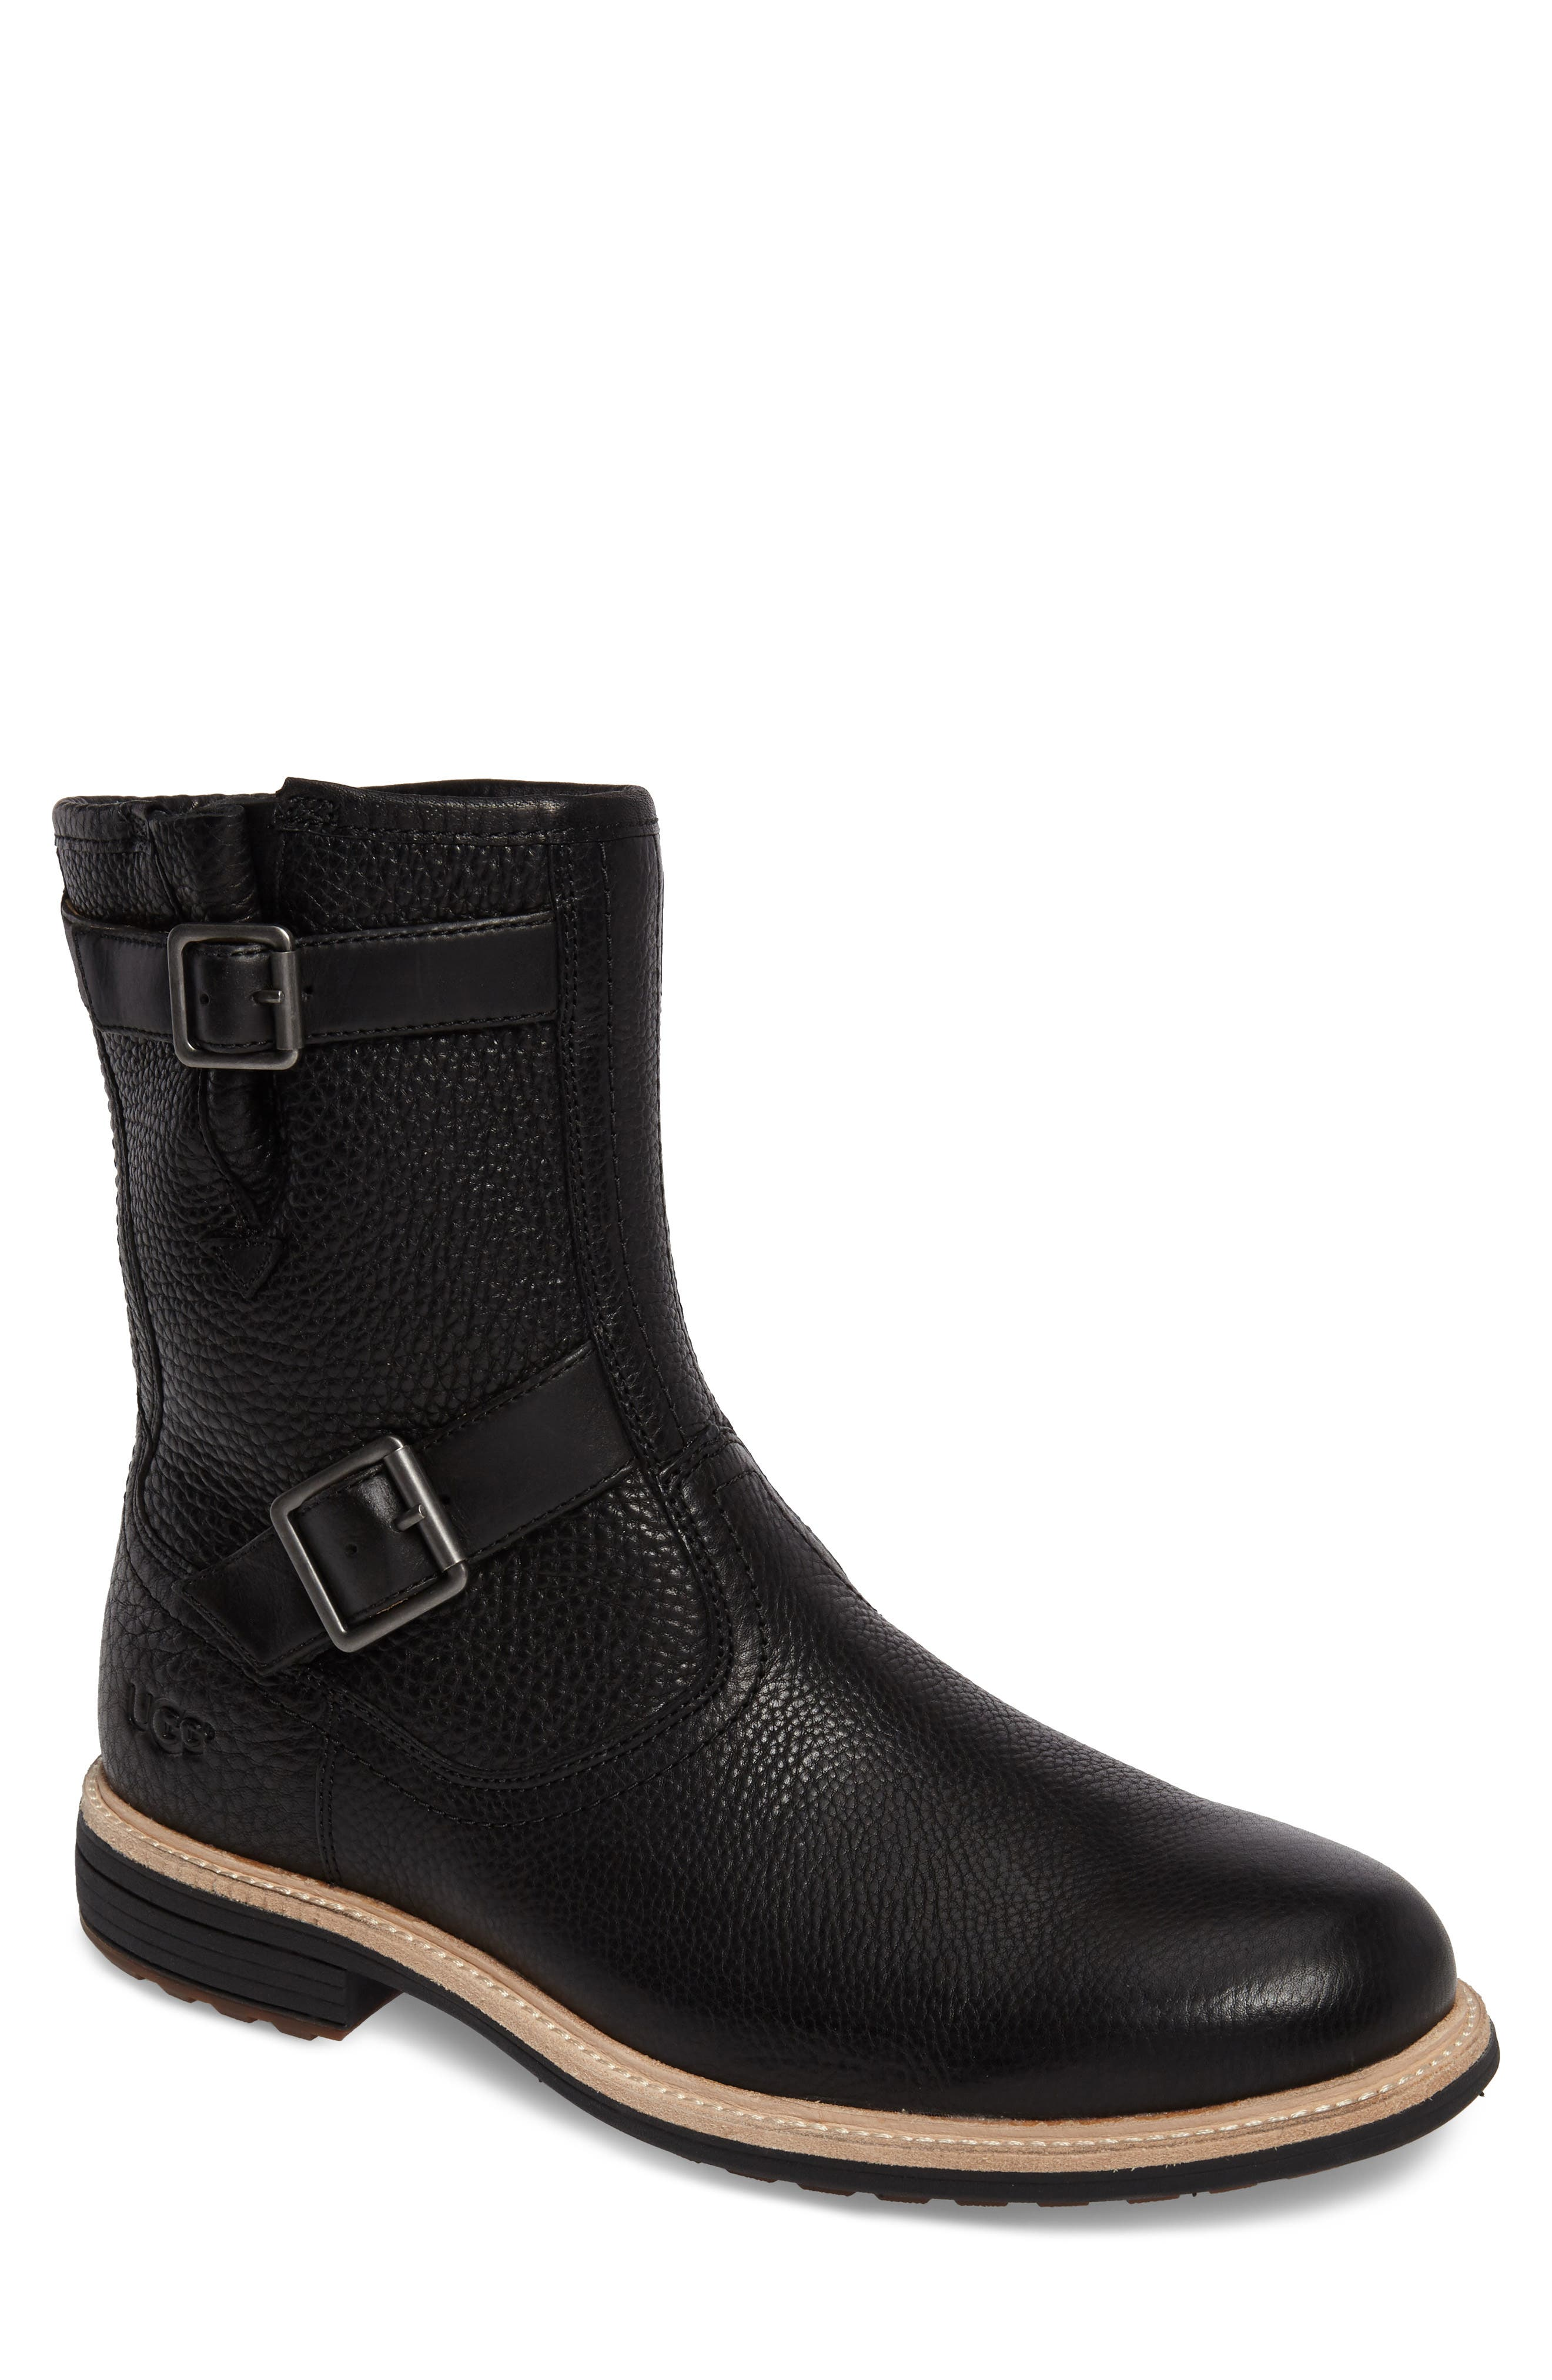 Jaren Zip Boot with Genuine Shearling,                         Main,                         color, Black